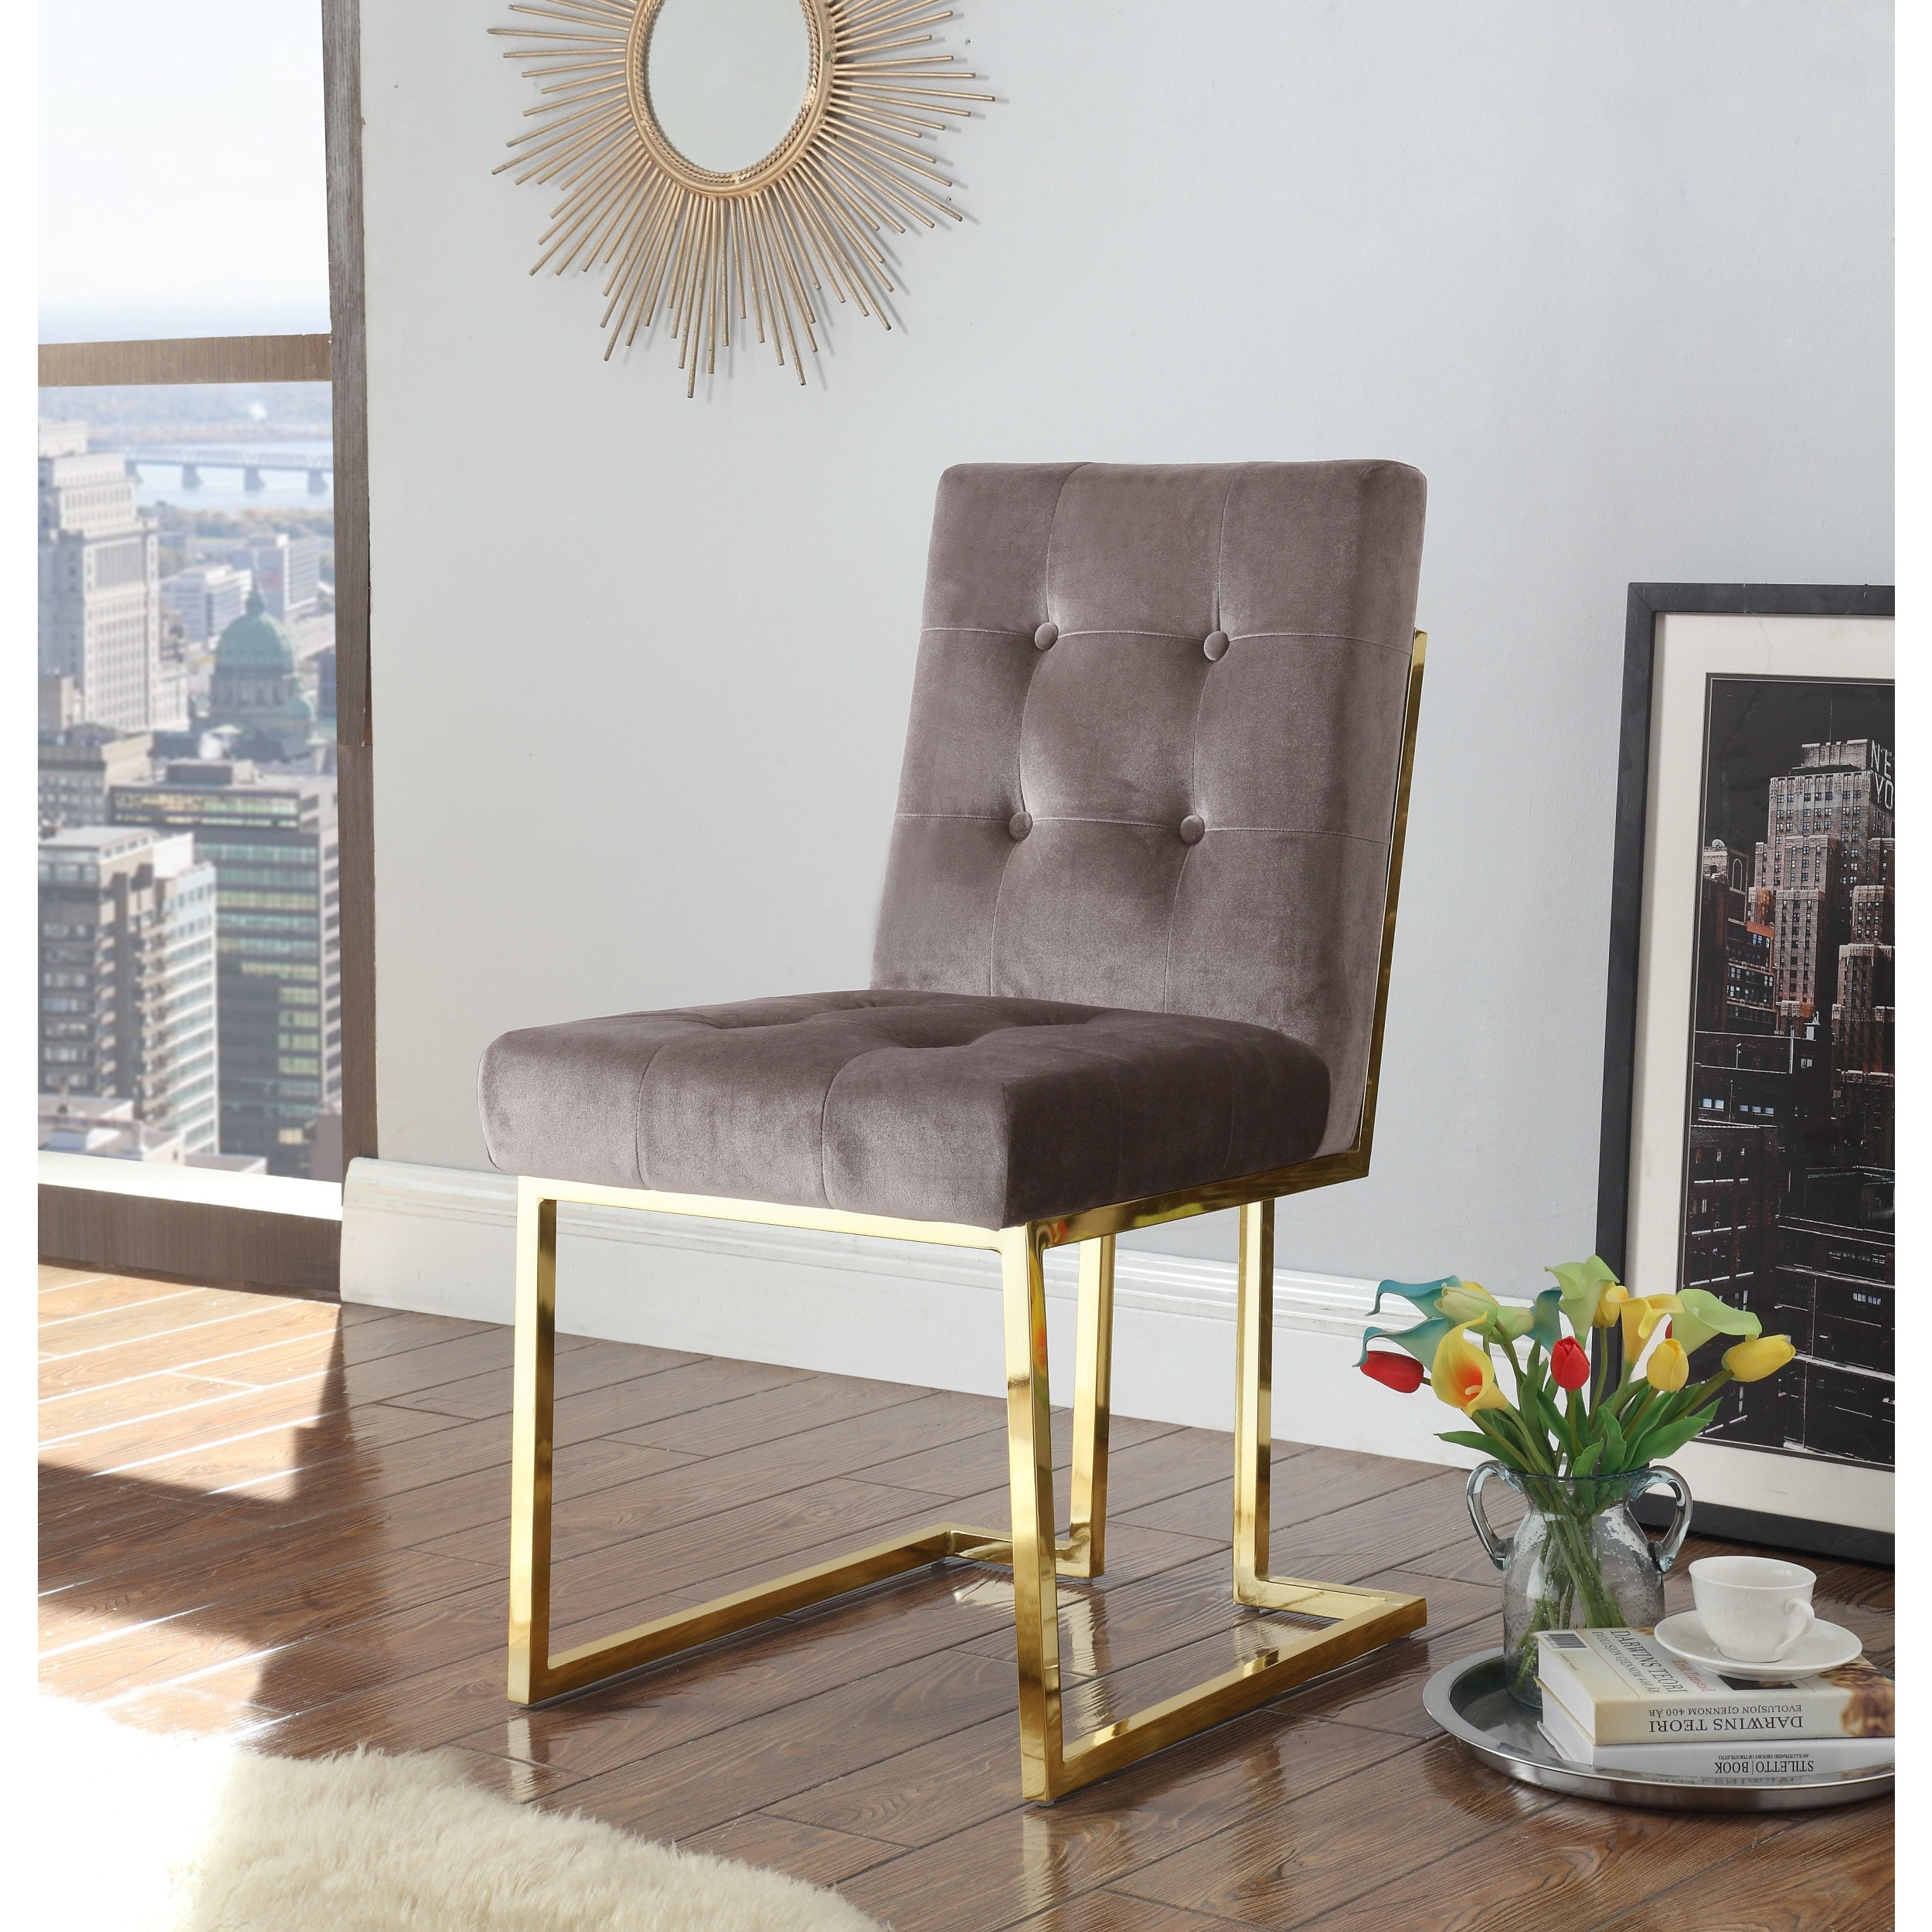 seat unupholstered brass plastic steel blackchrome beetle cushion front conic shell gubi legs fixed en chair diningchair bluegrey